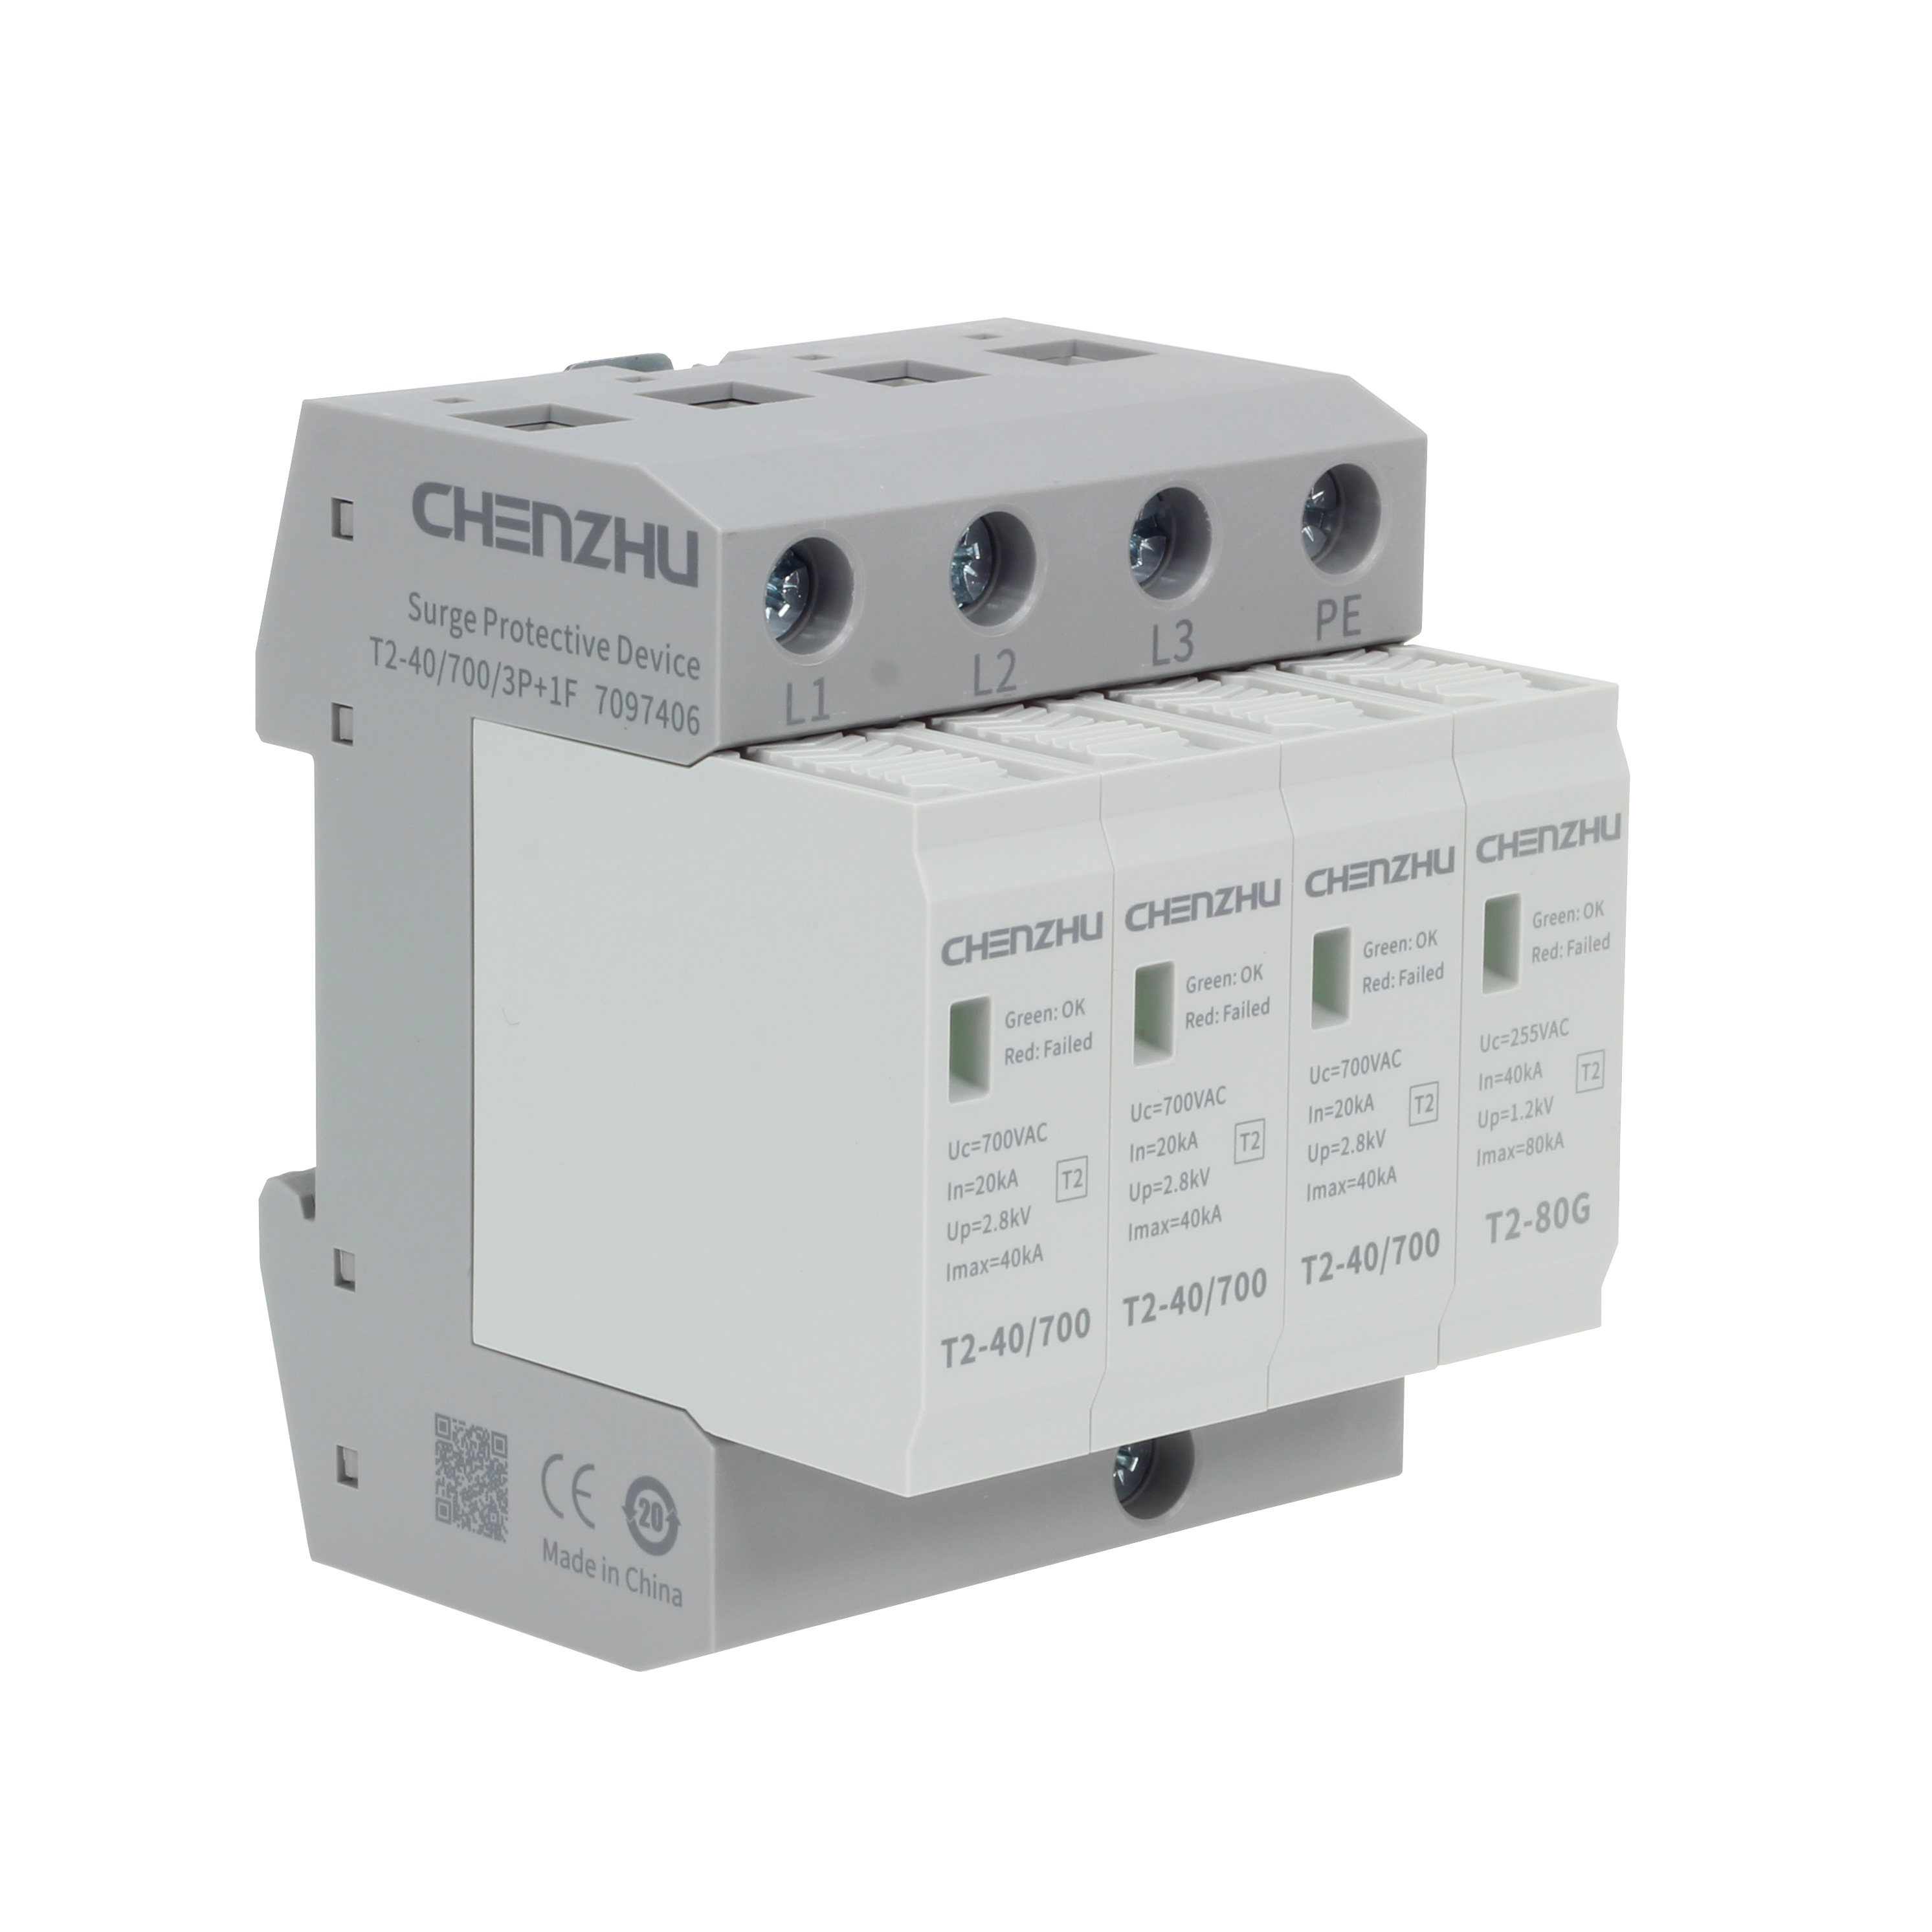 AC Power SPD (400/690VAC; Three phase TT; In=20kA) 7016349